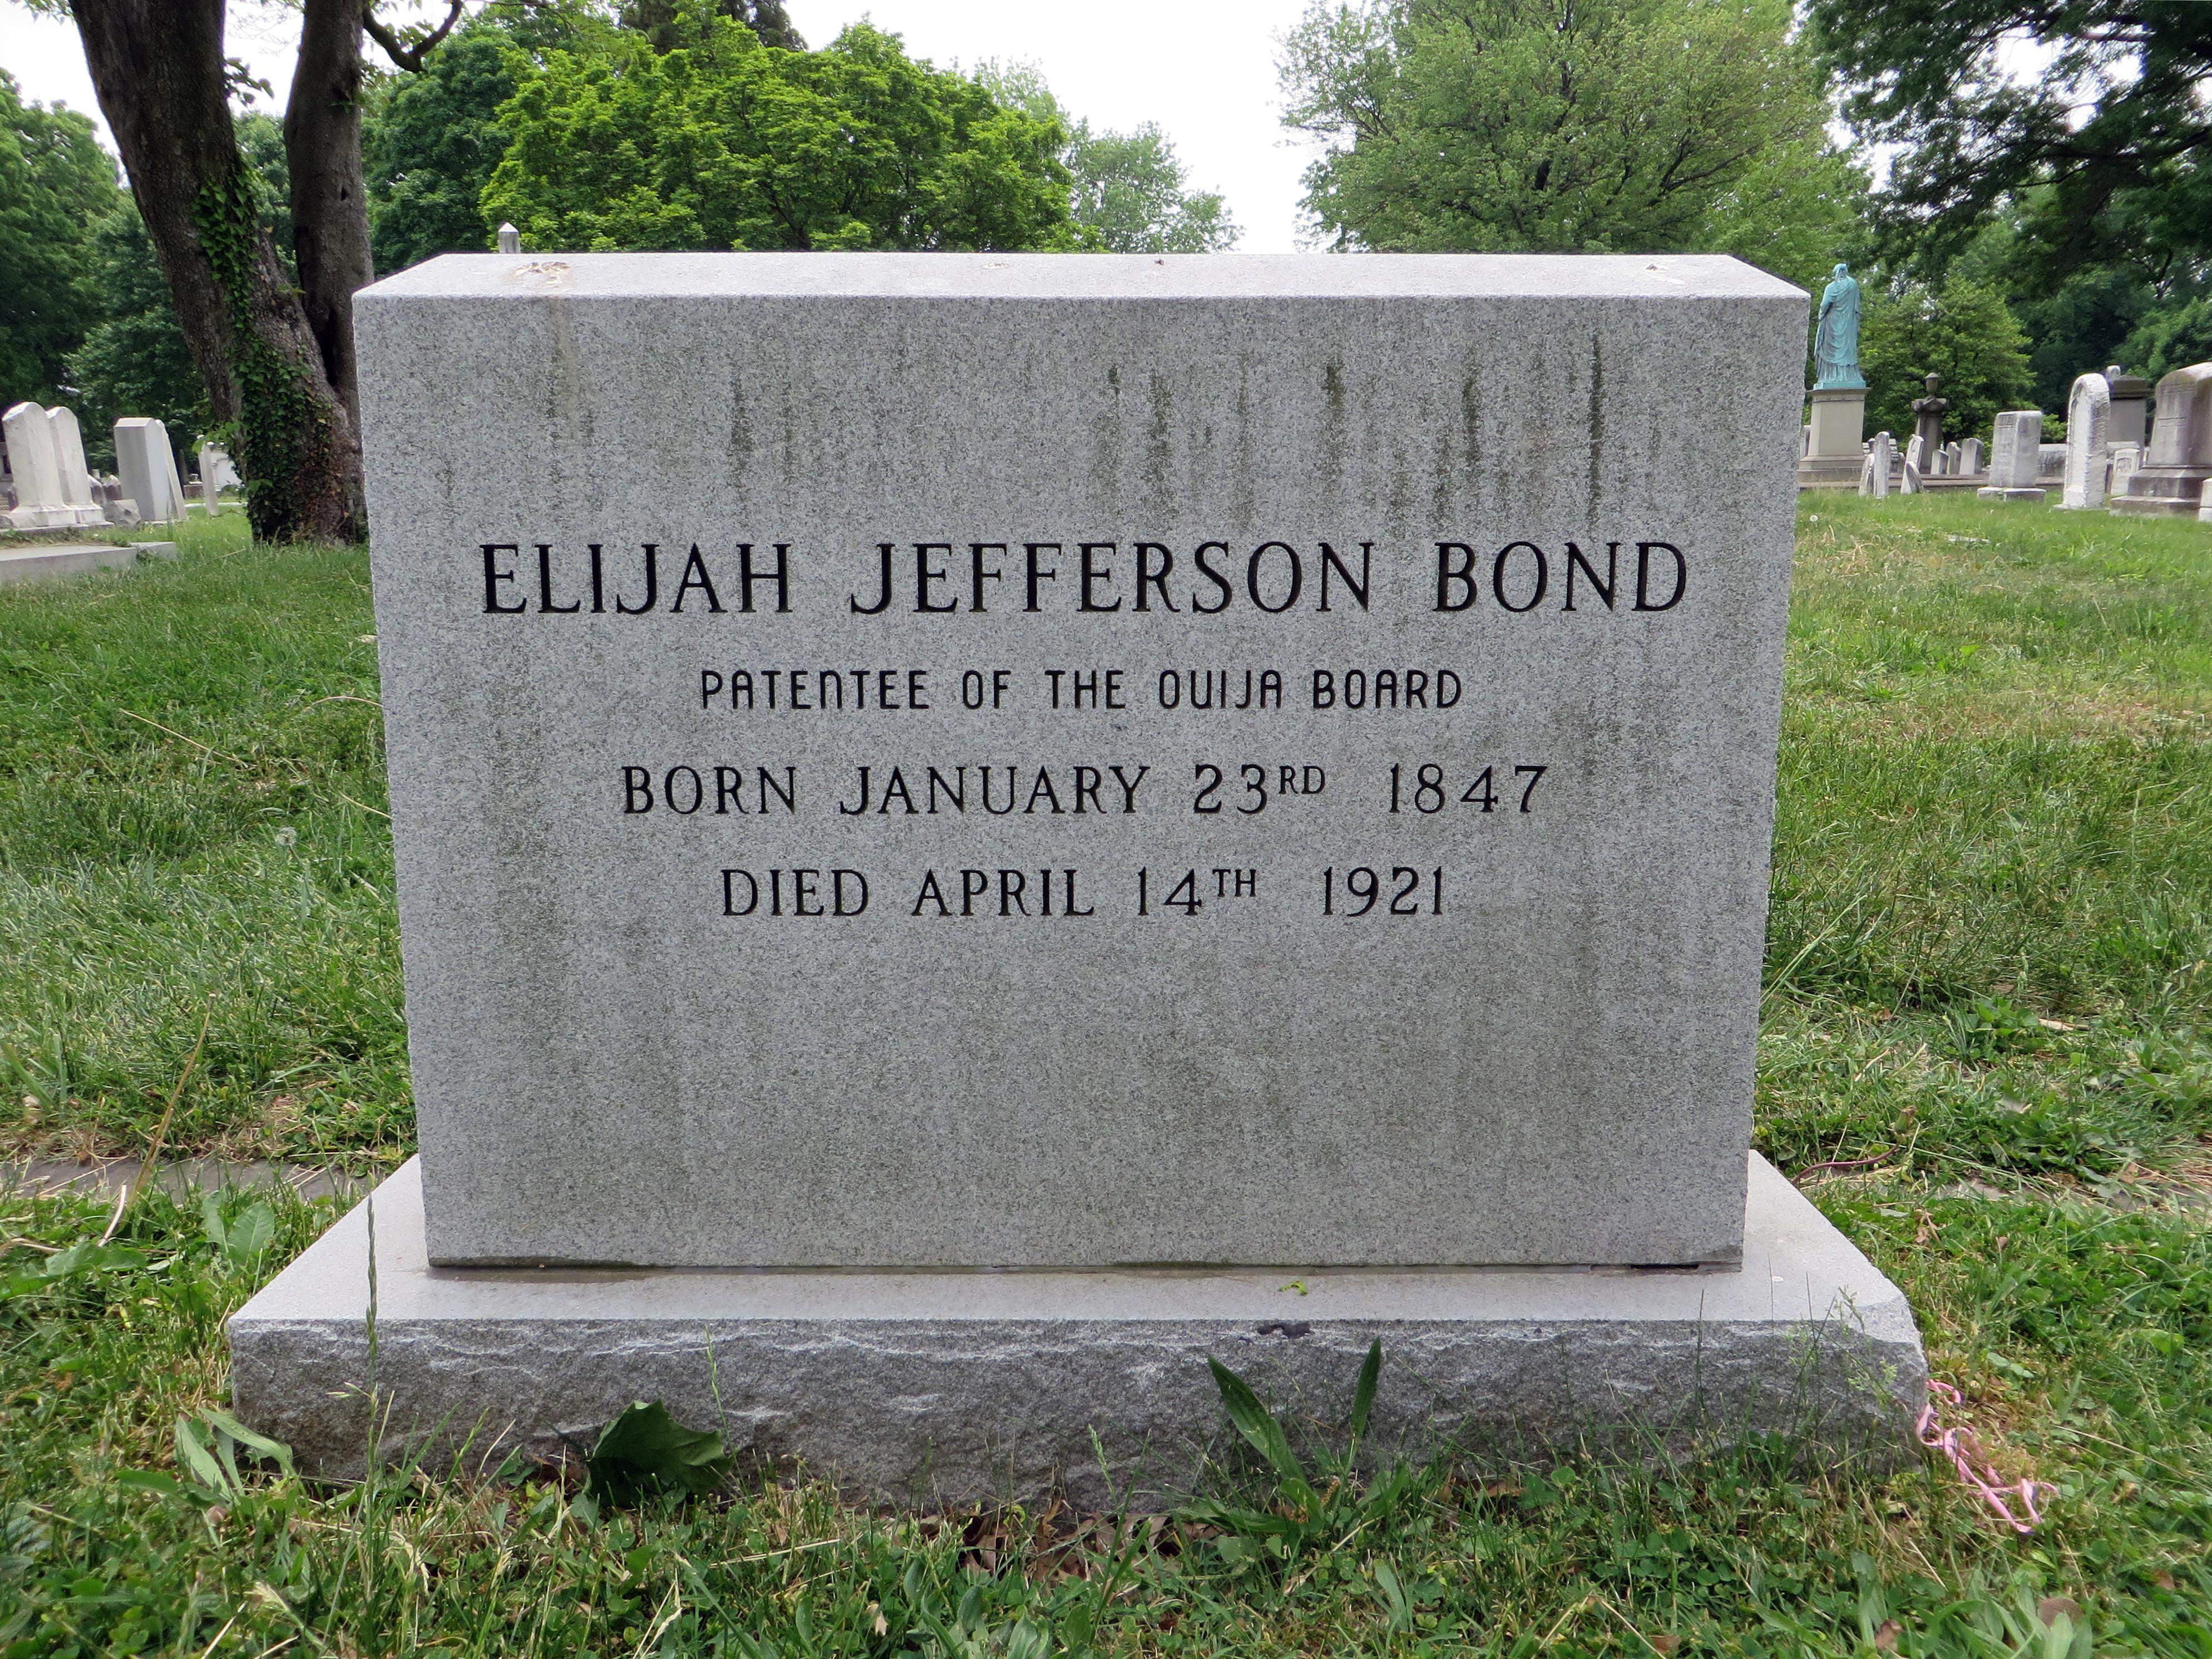 File:Elijah Jefferson Bond Gravestone Front Detail.jpg - Wikipedia